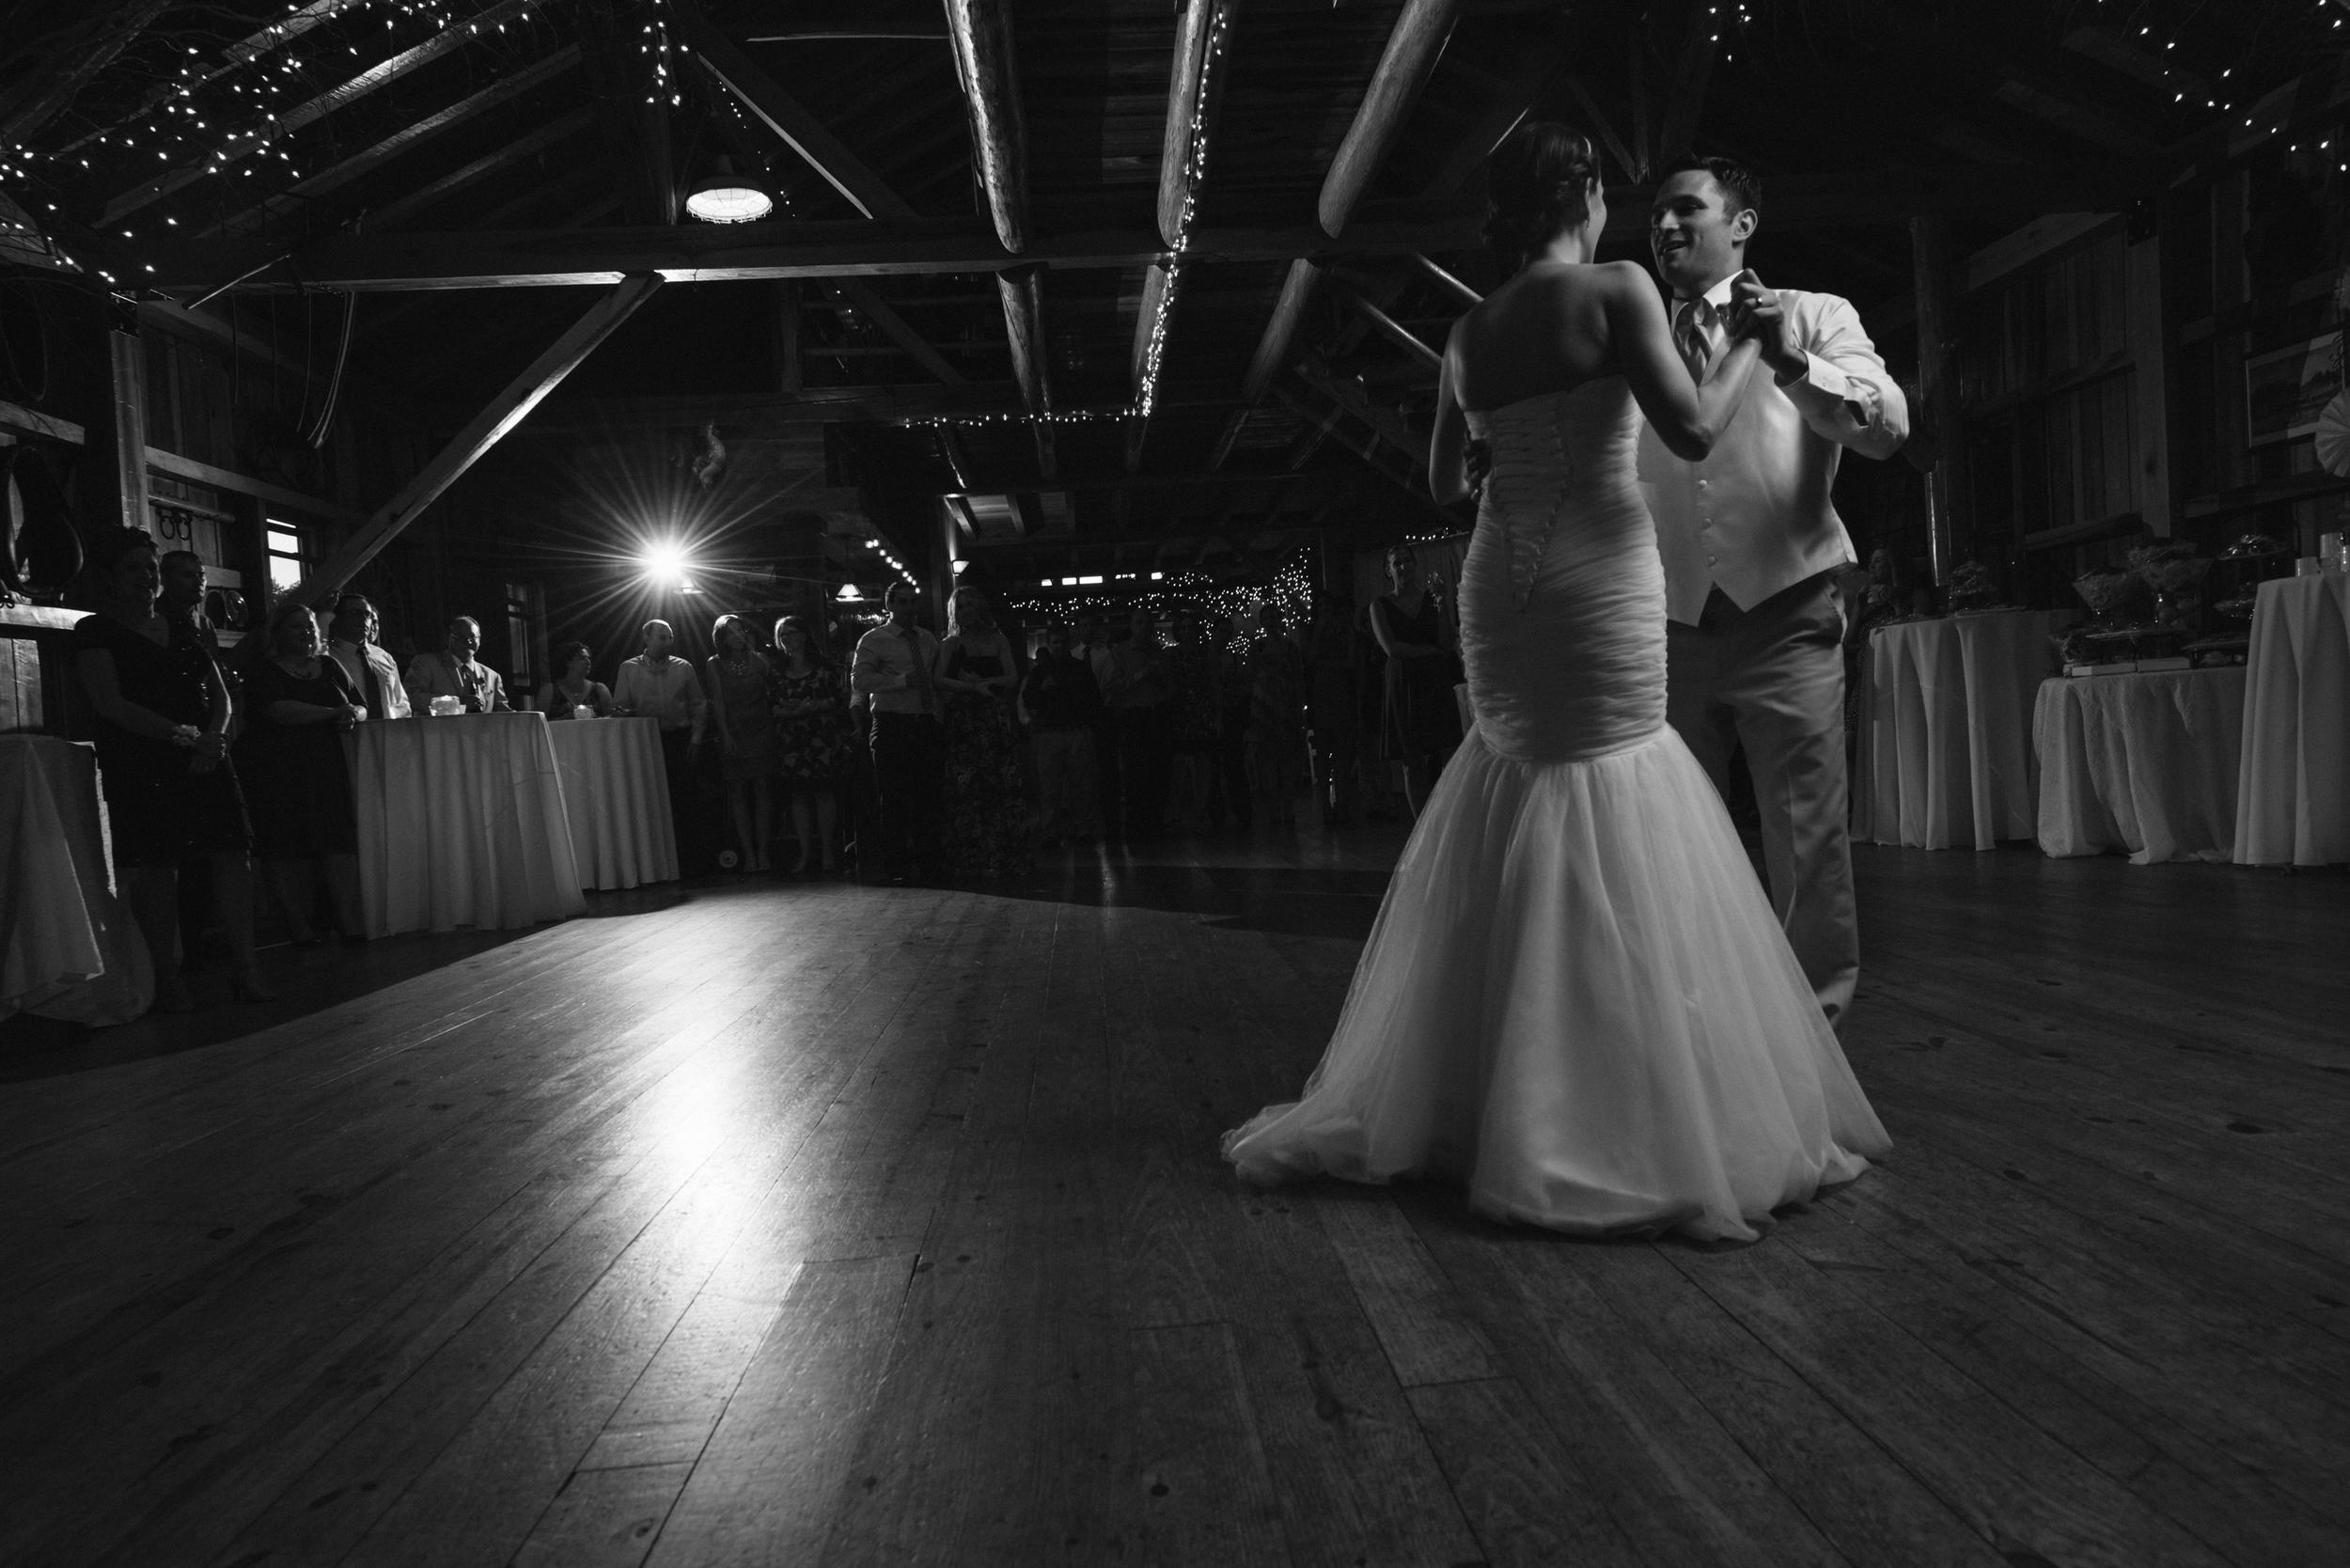 Matt_Swetel_Photography_Erin_and_Jeff_married046.jpg